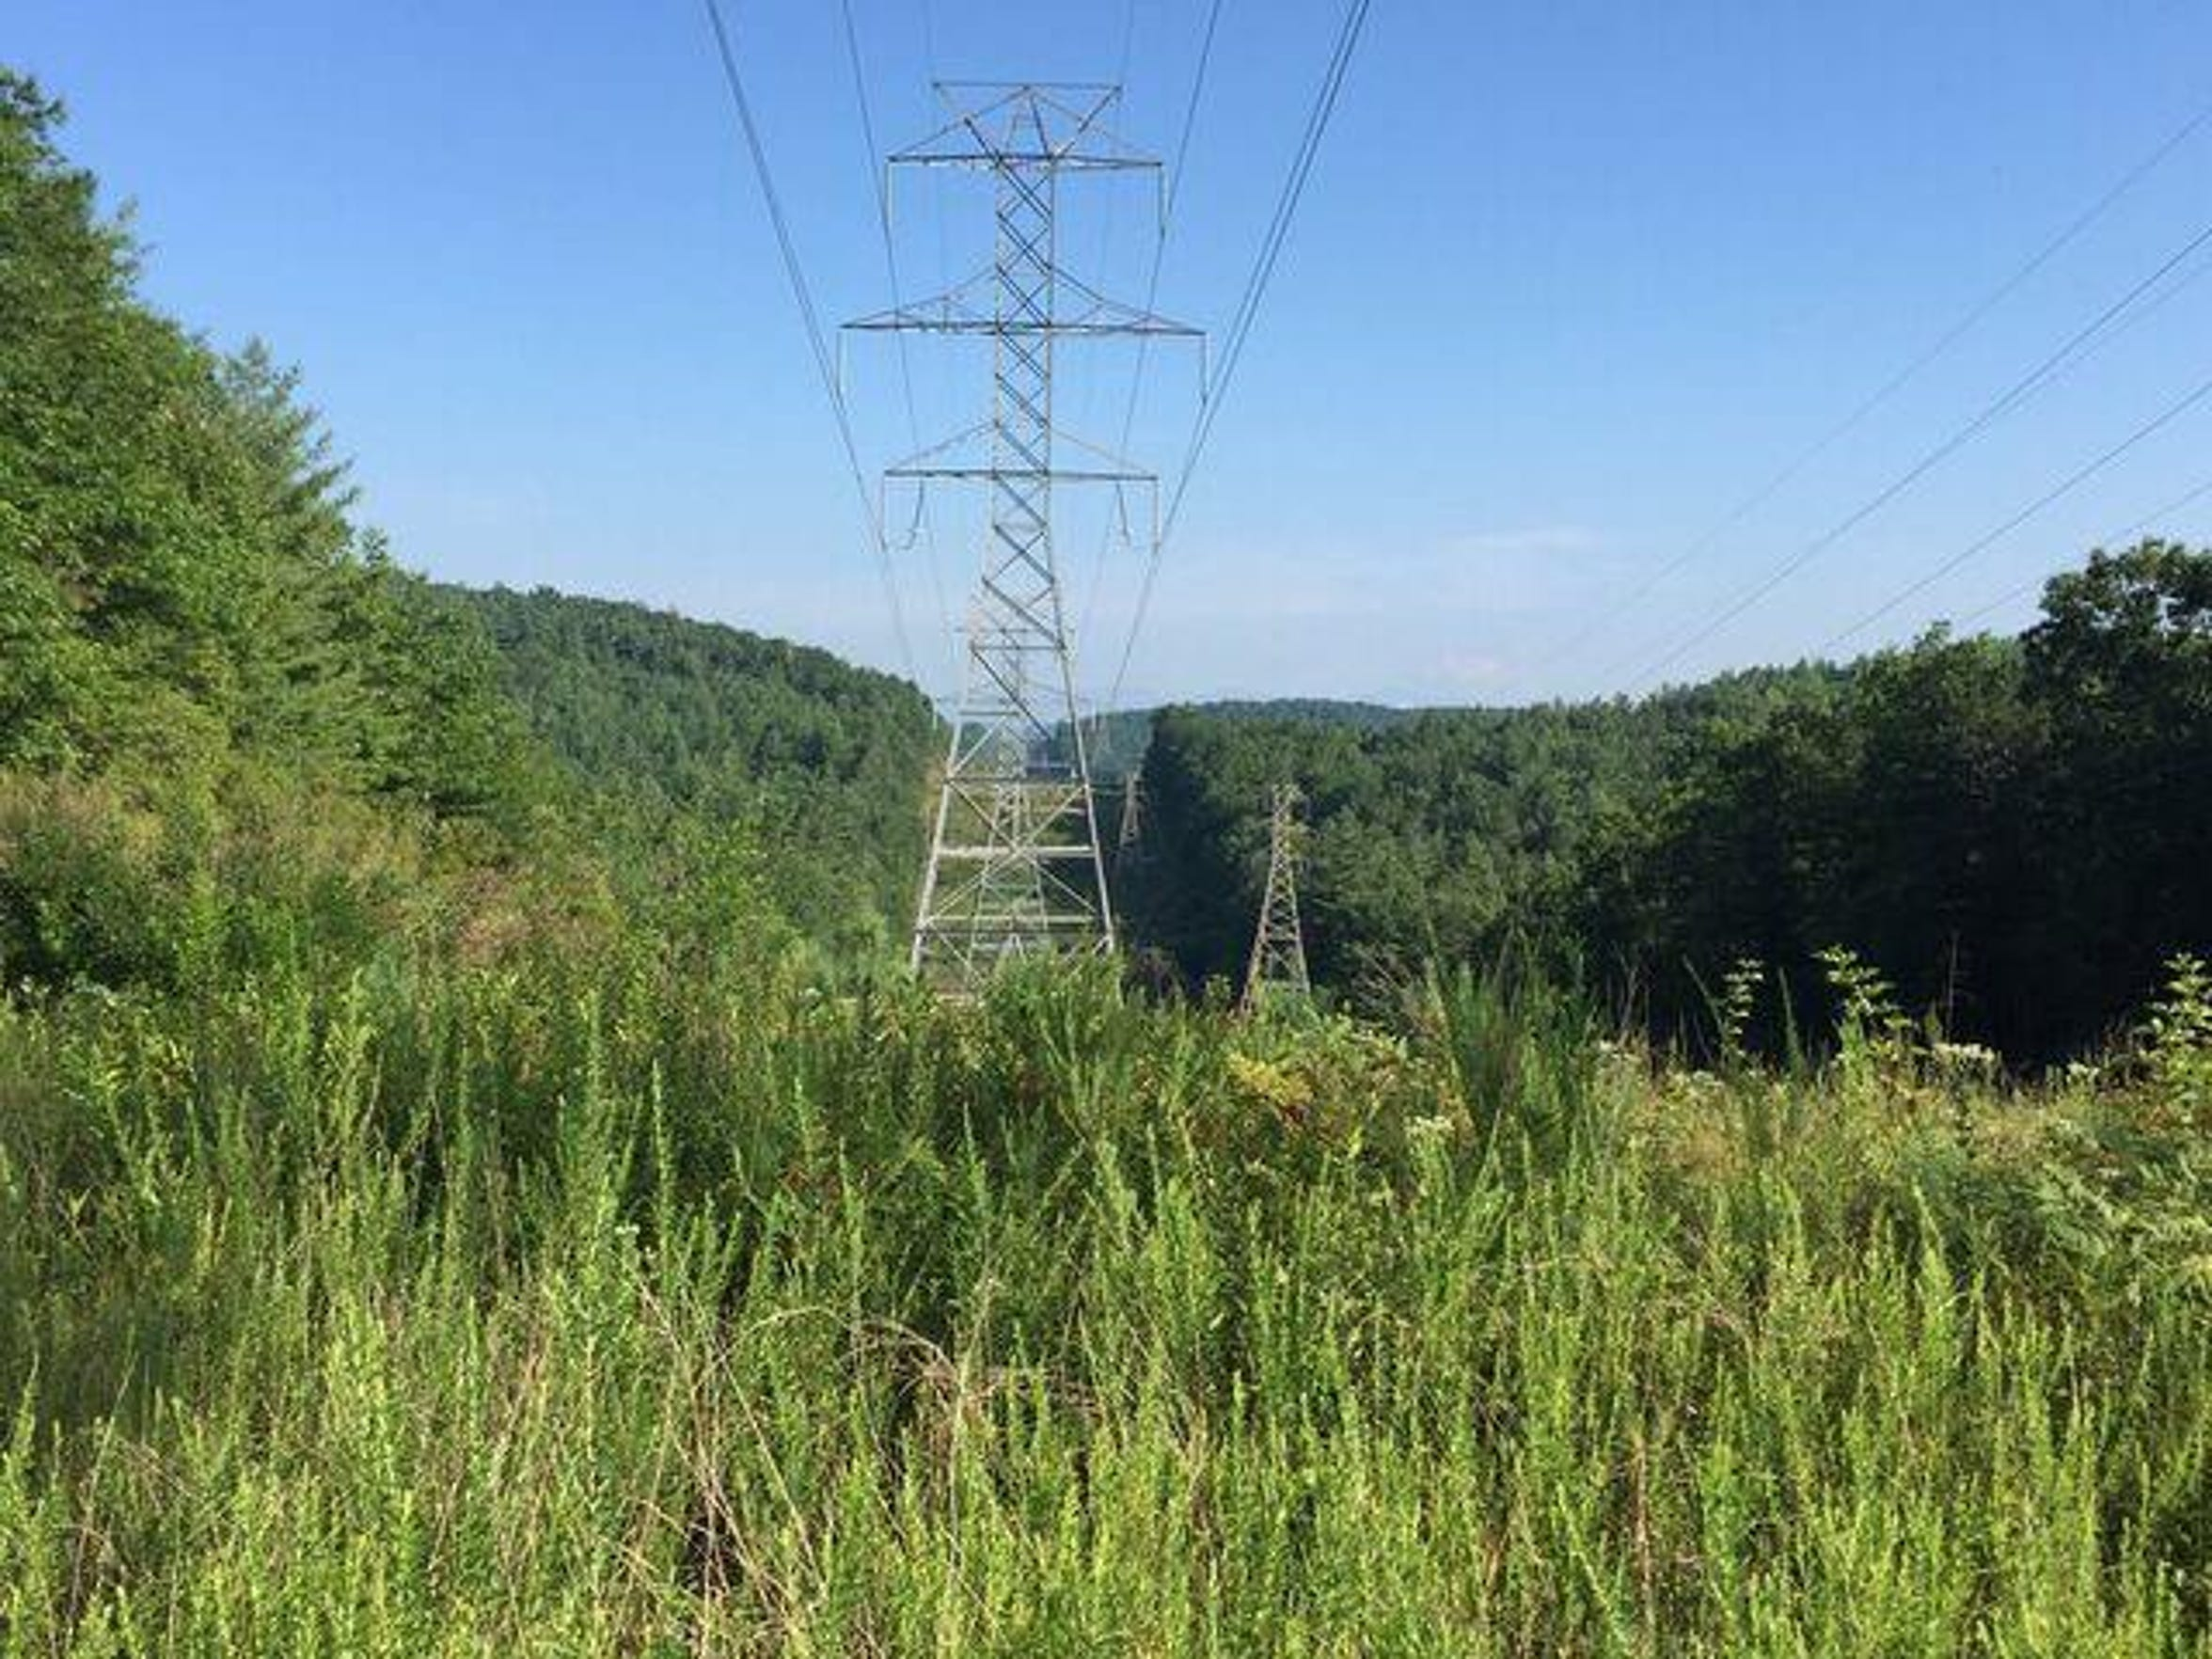 A transmission line.